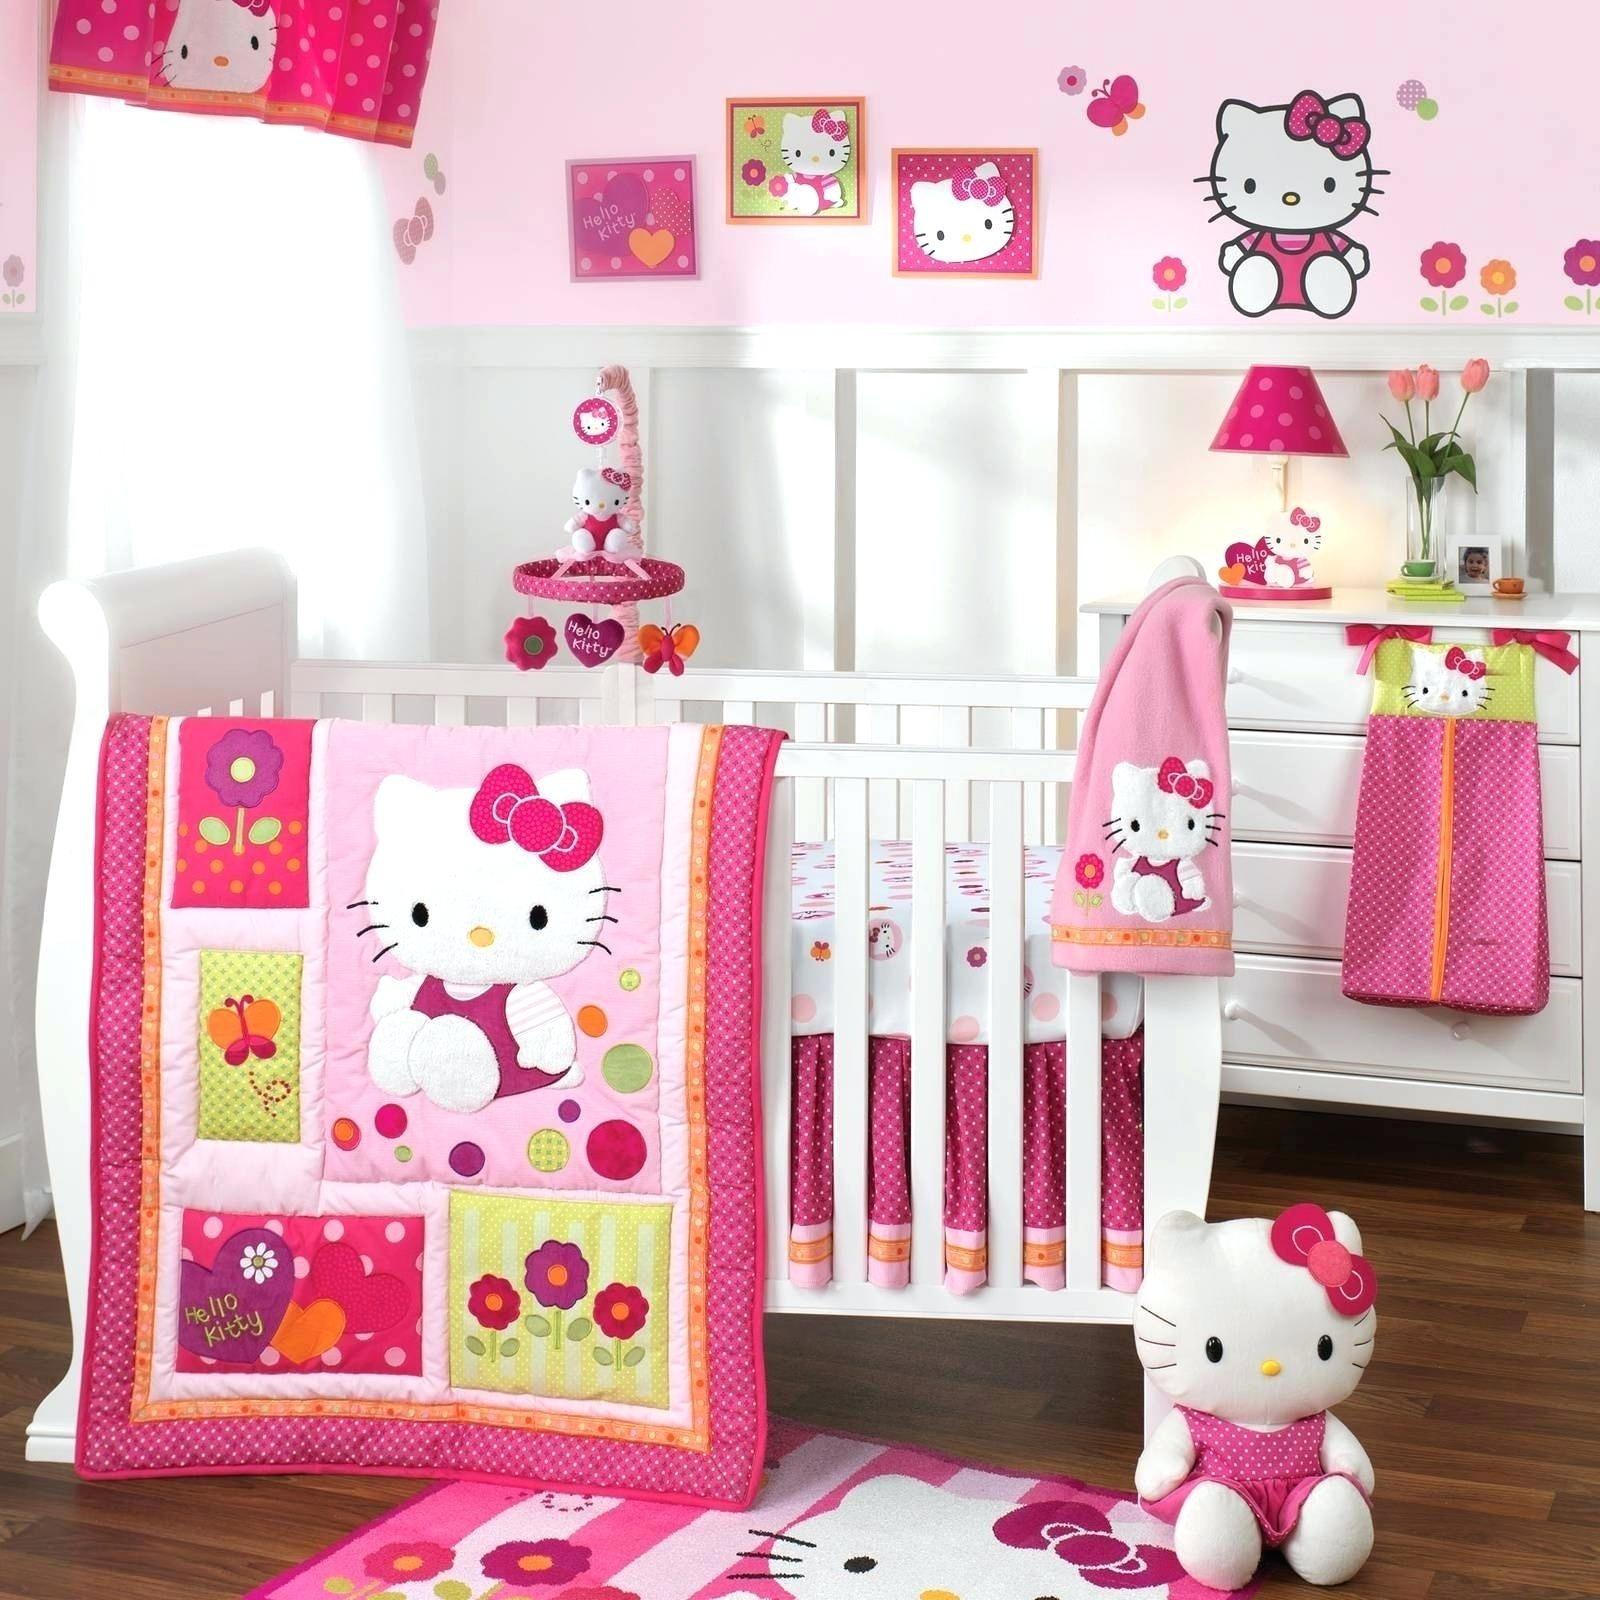 10 Perfect Little Girls Room Decor Ideas decoration little girl room decor ideas 2020